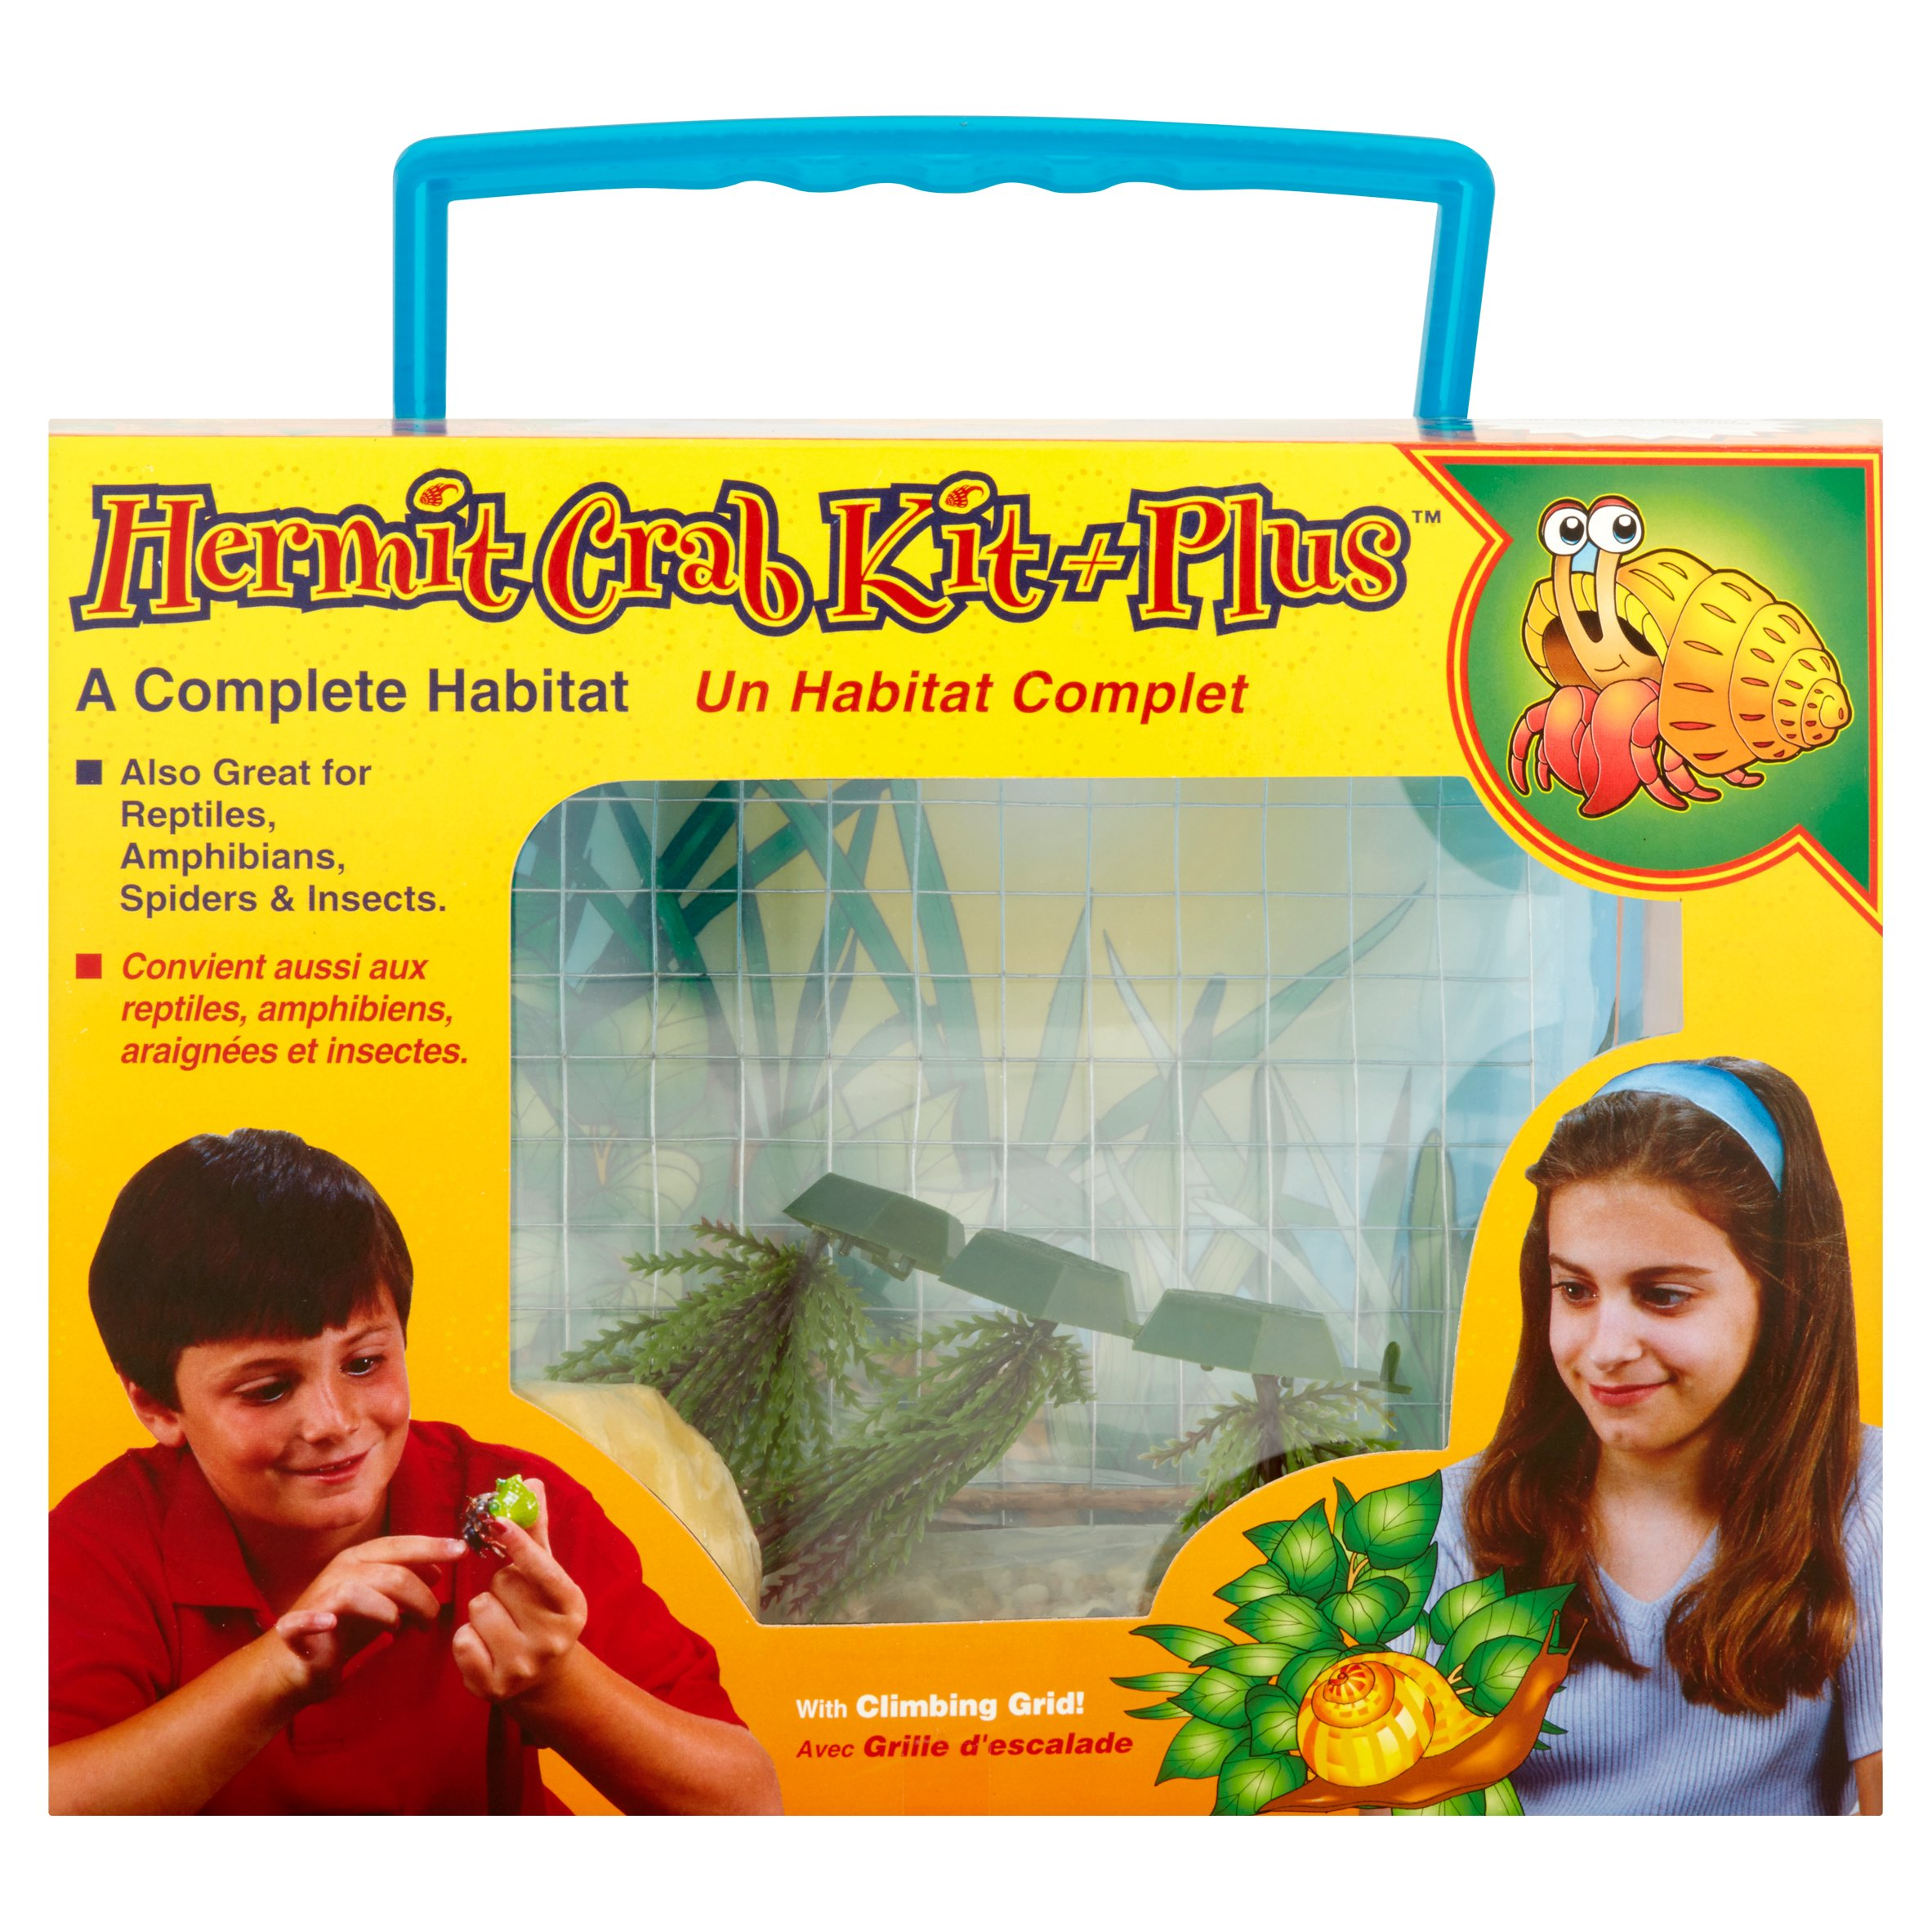 Penn Plax Hermit Crab Starter Kit Plus